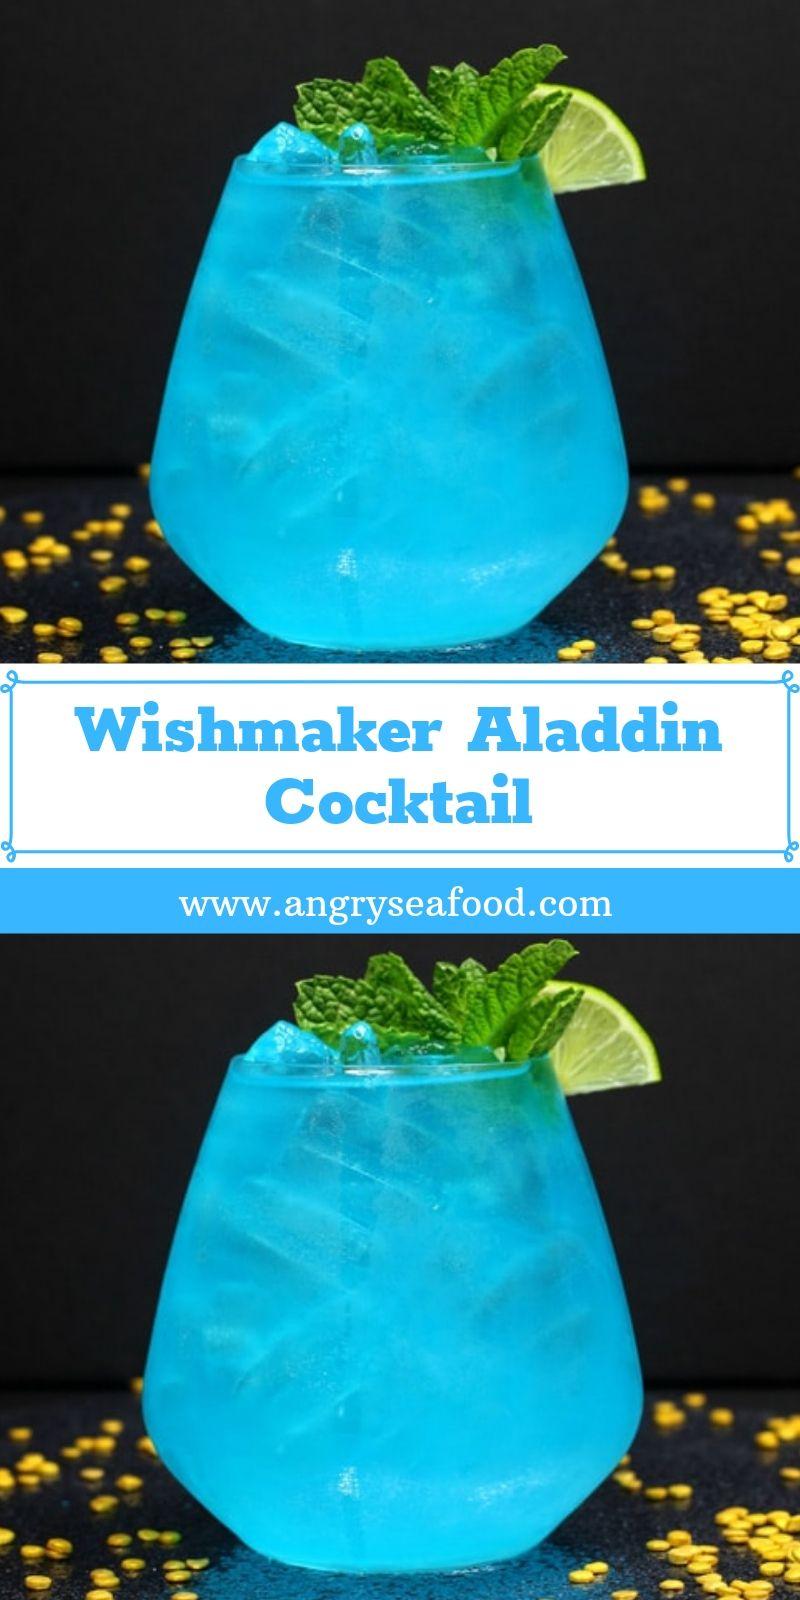 Wishmaker Aladdin Cocktail